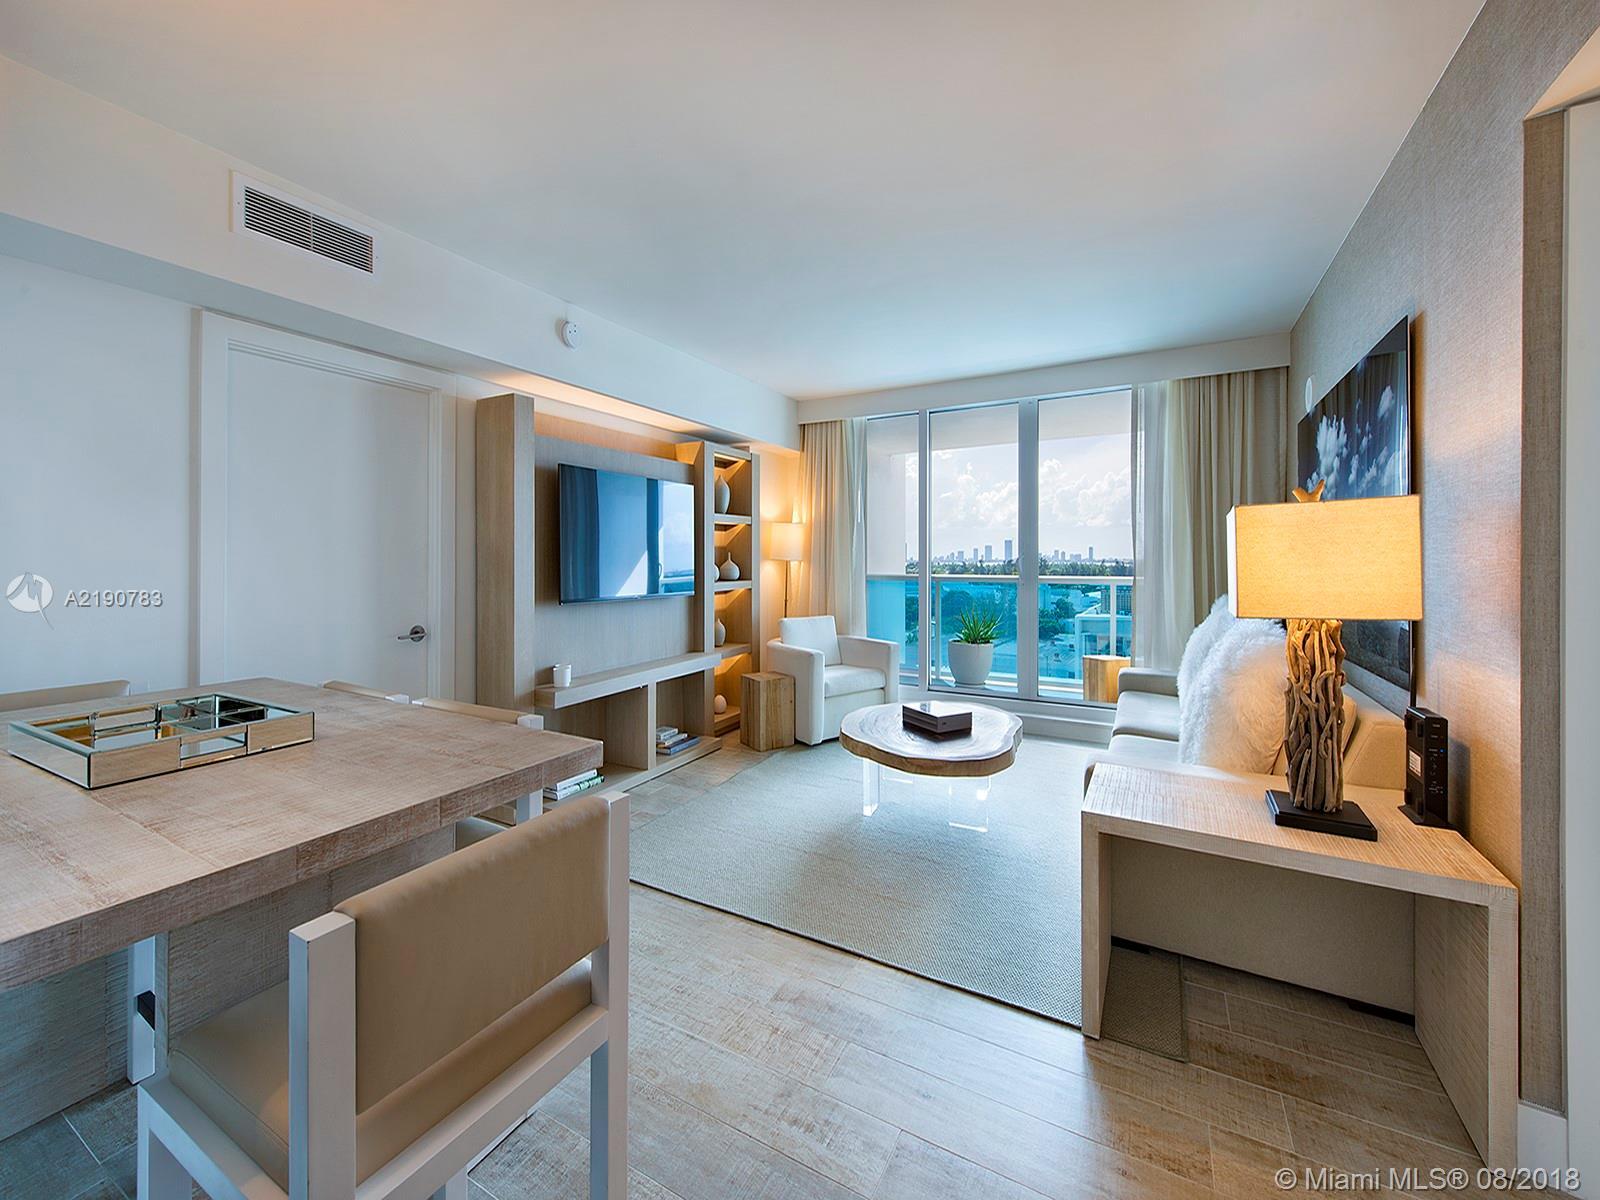 102 24 STREET #1045, Miami Beach, FL 33139 - Miami Beach, FL real estate listing